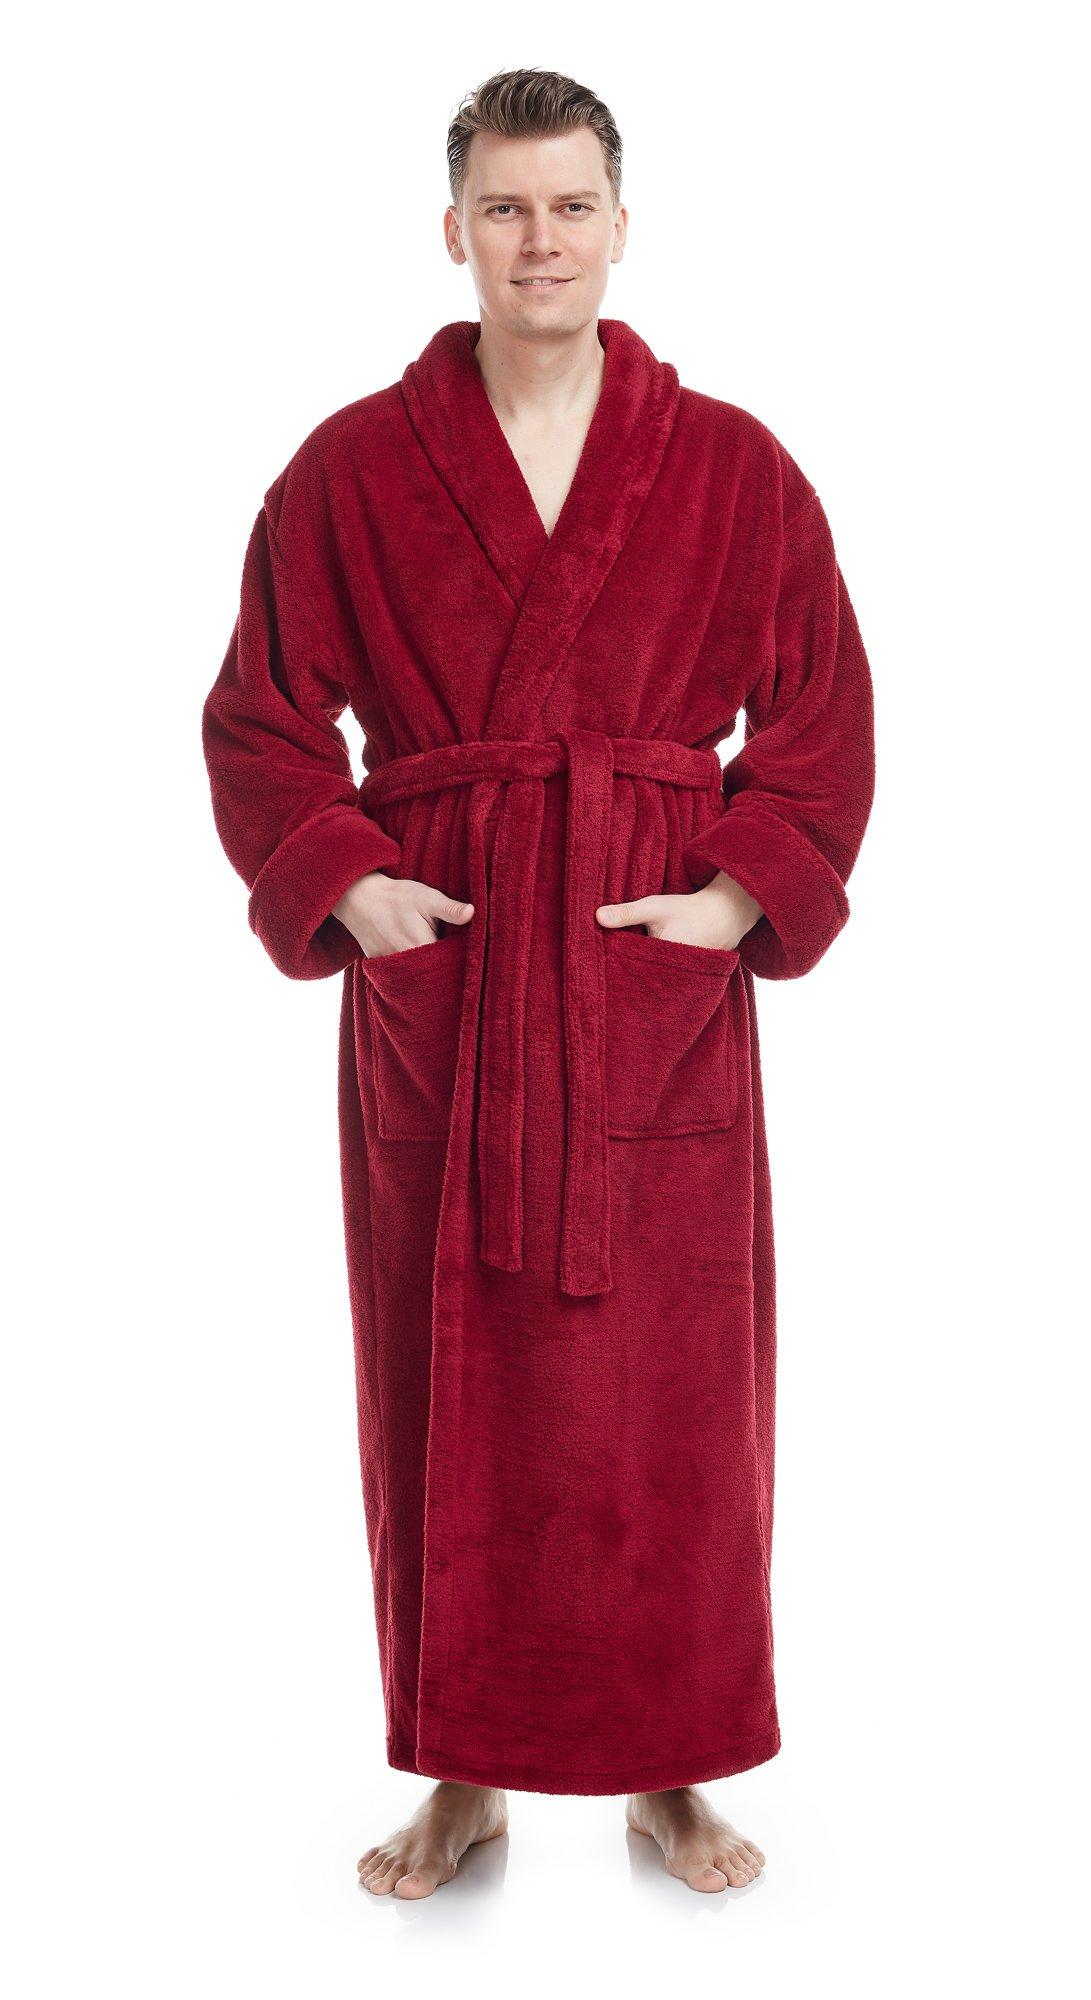 Arus Men's Shawl Collar Full Length Long Fleece Robe, Turkish Bathrobe, Wine, L/XL